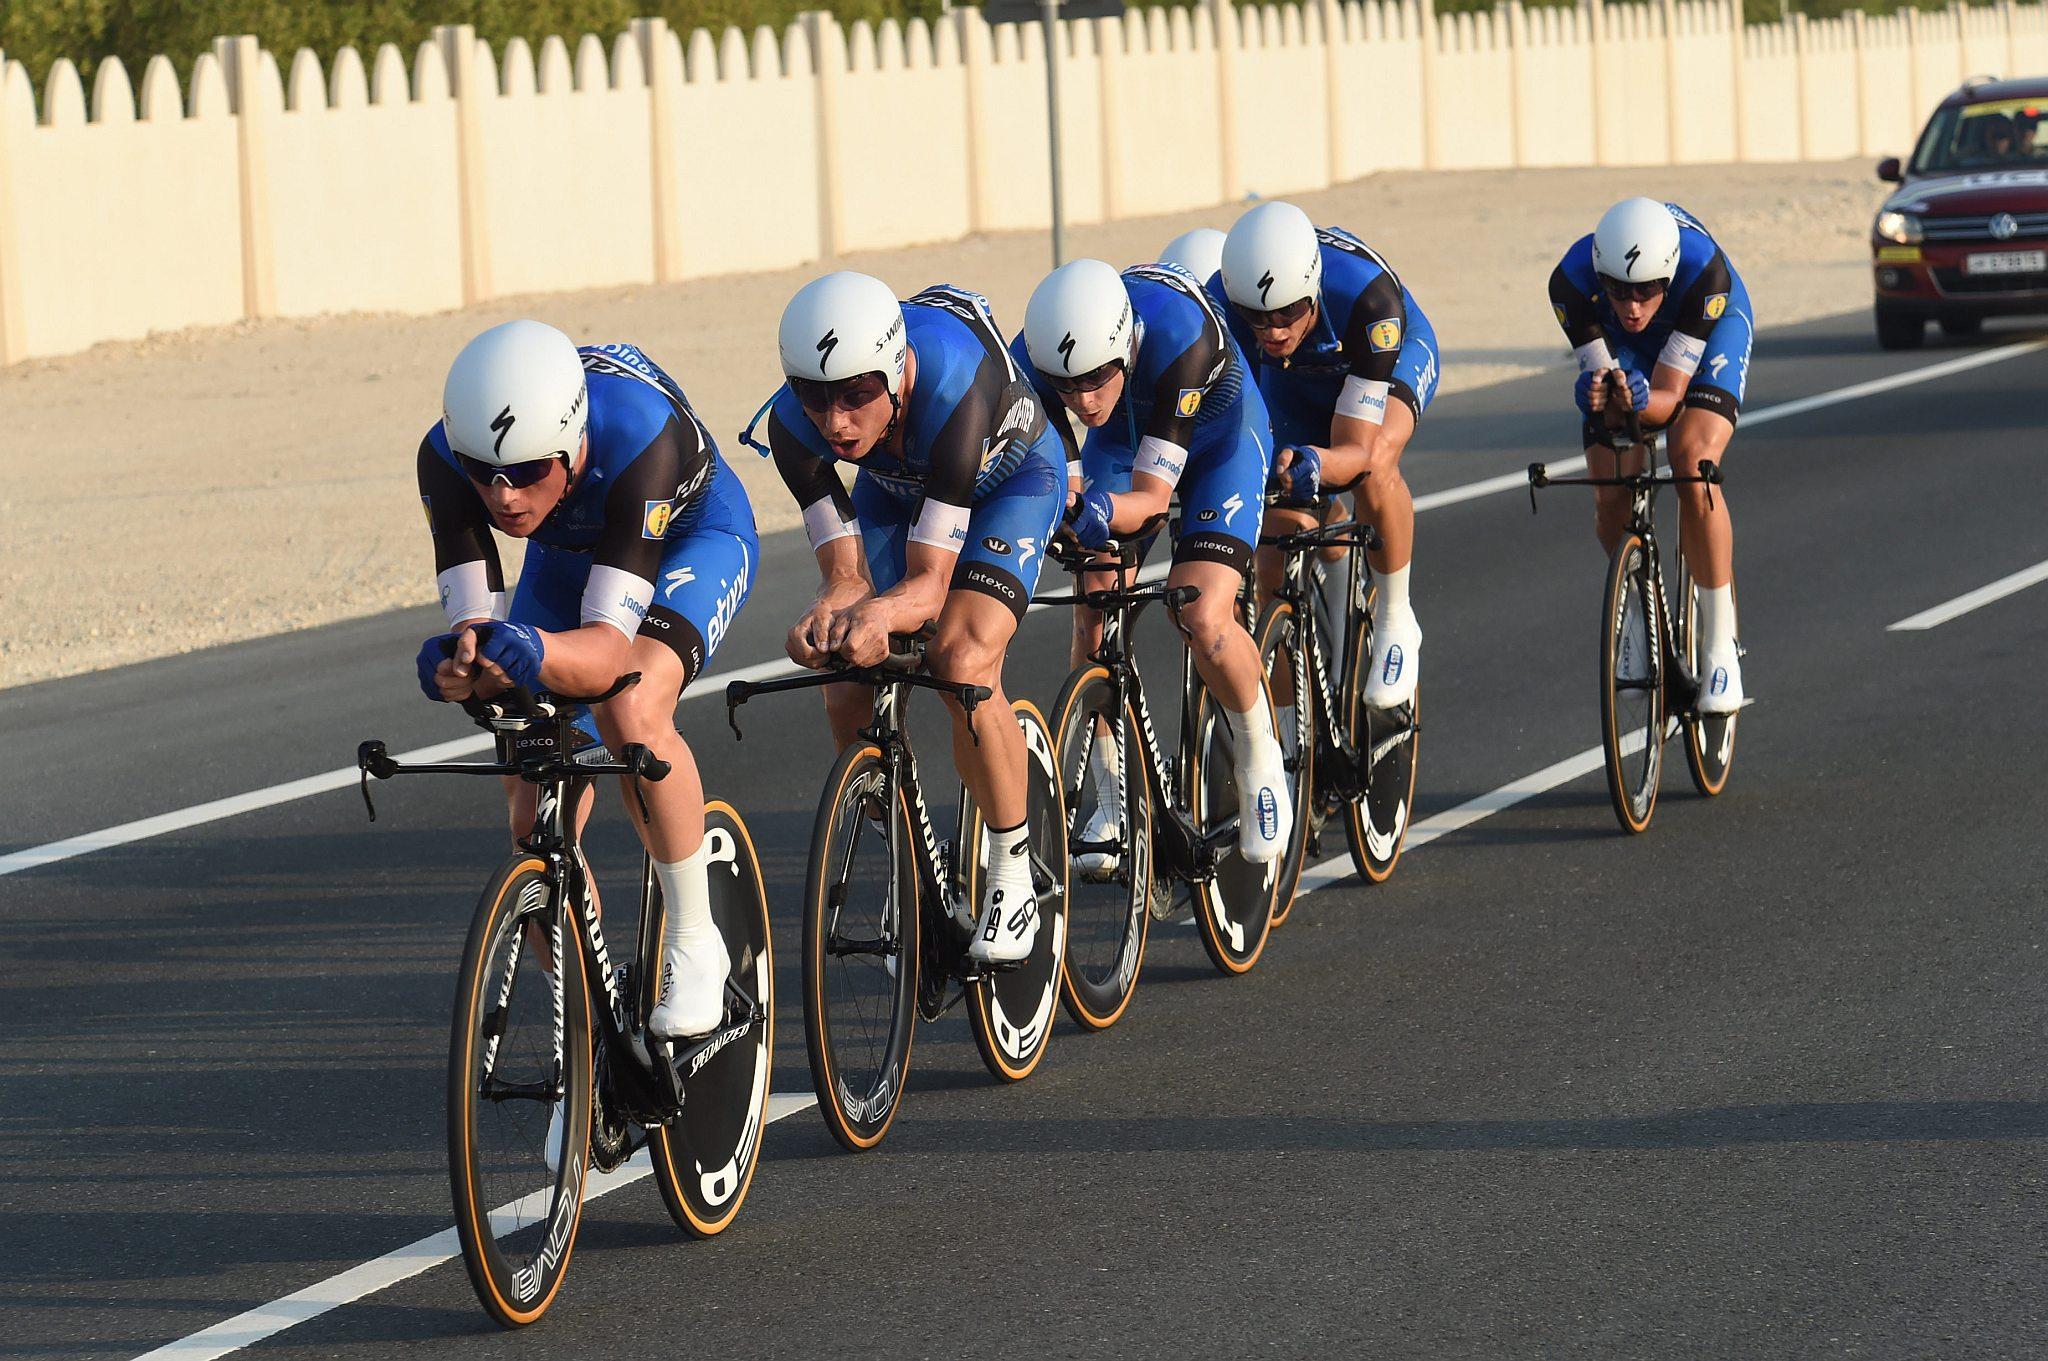 09-10-2016 World Championship Team Time Trial; 2016, Etixx - Quick Step;